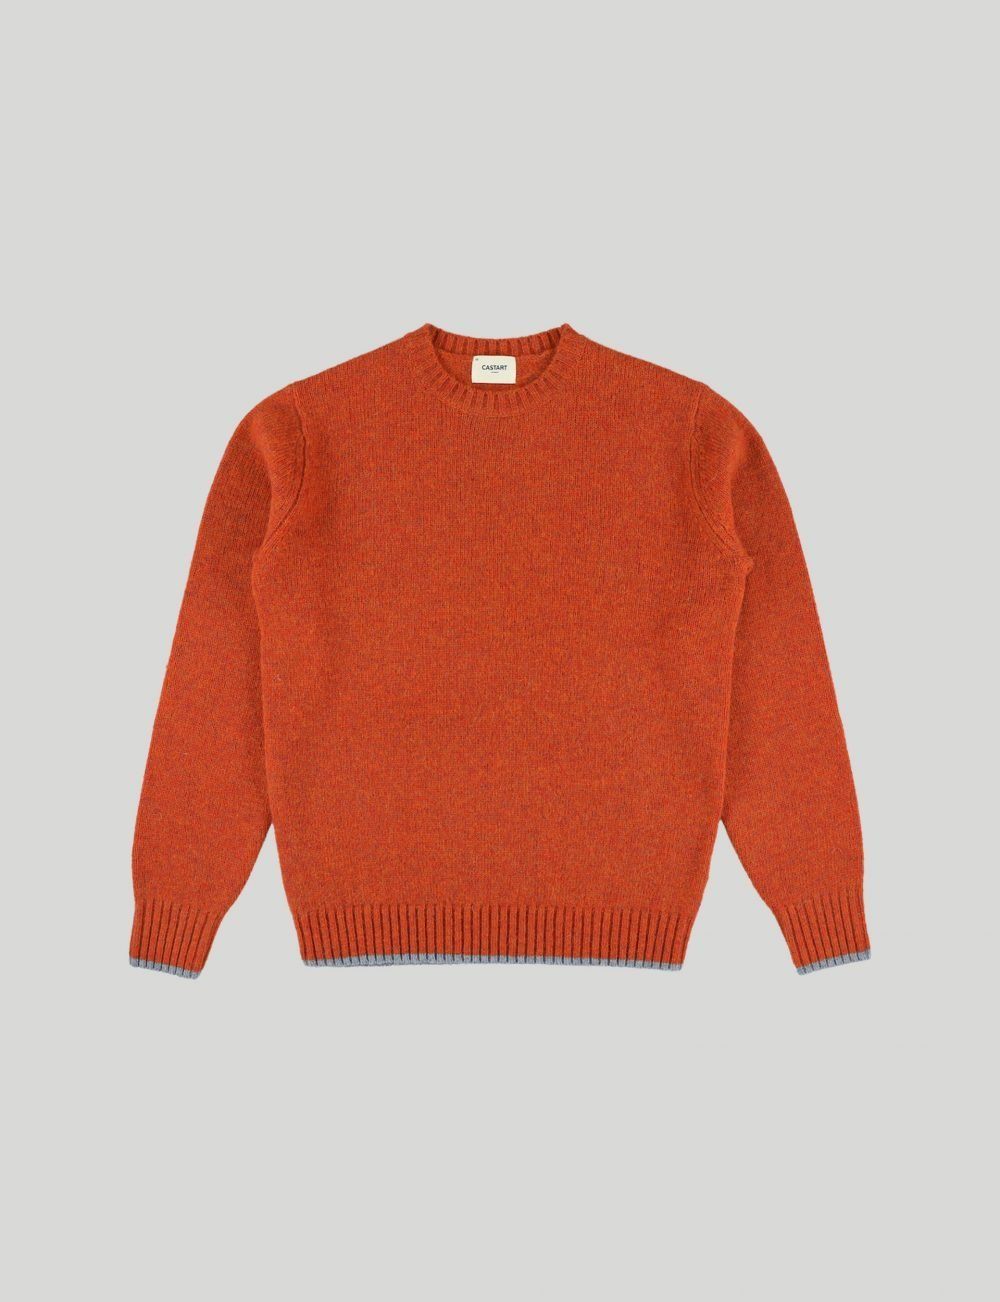 Castart - Kotin Knitwear - Orange